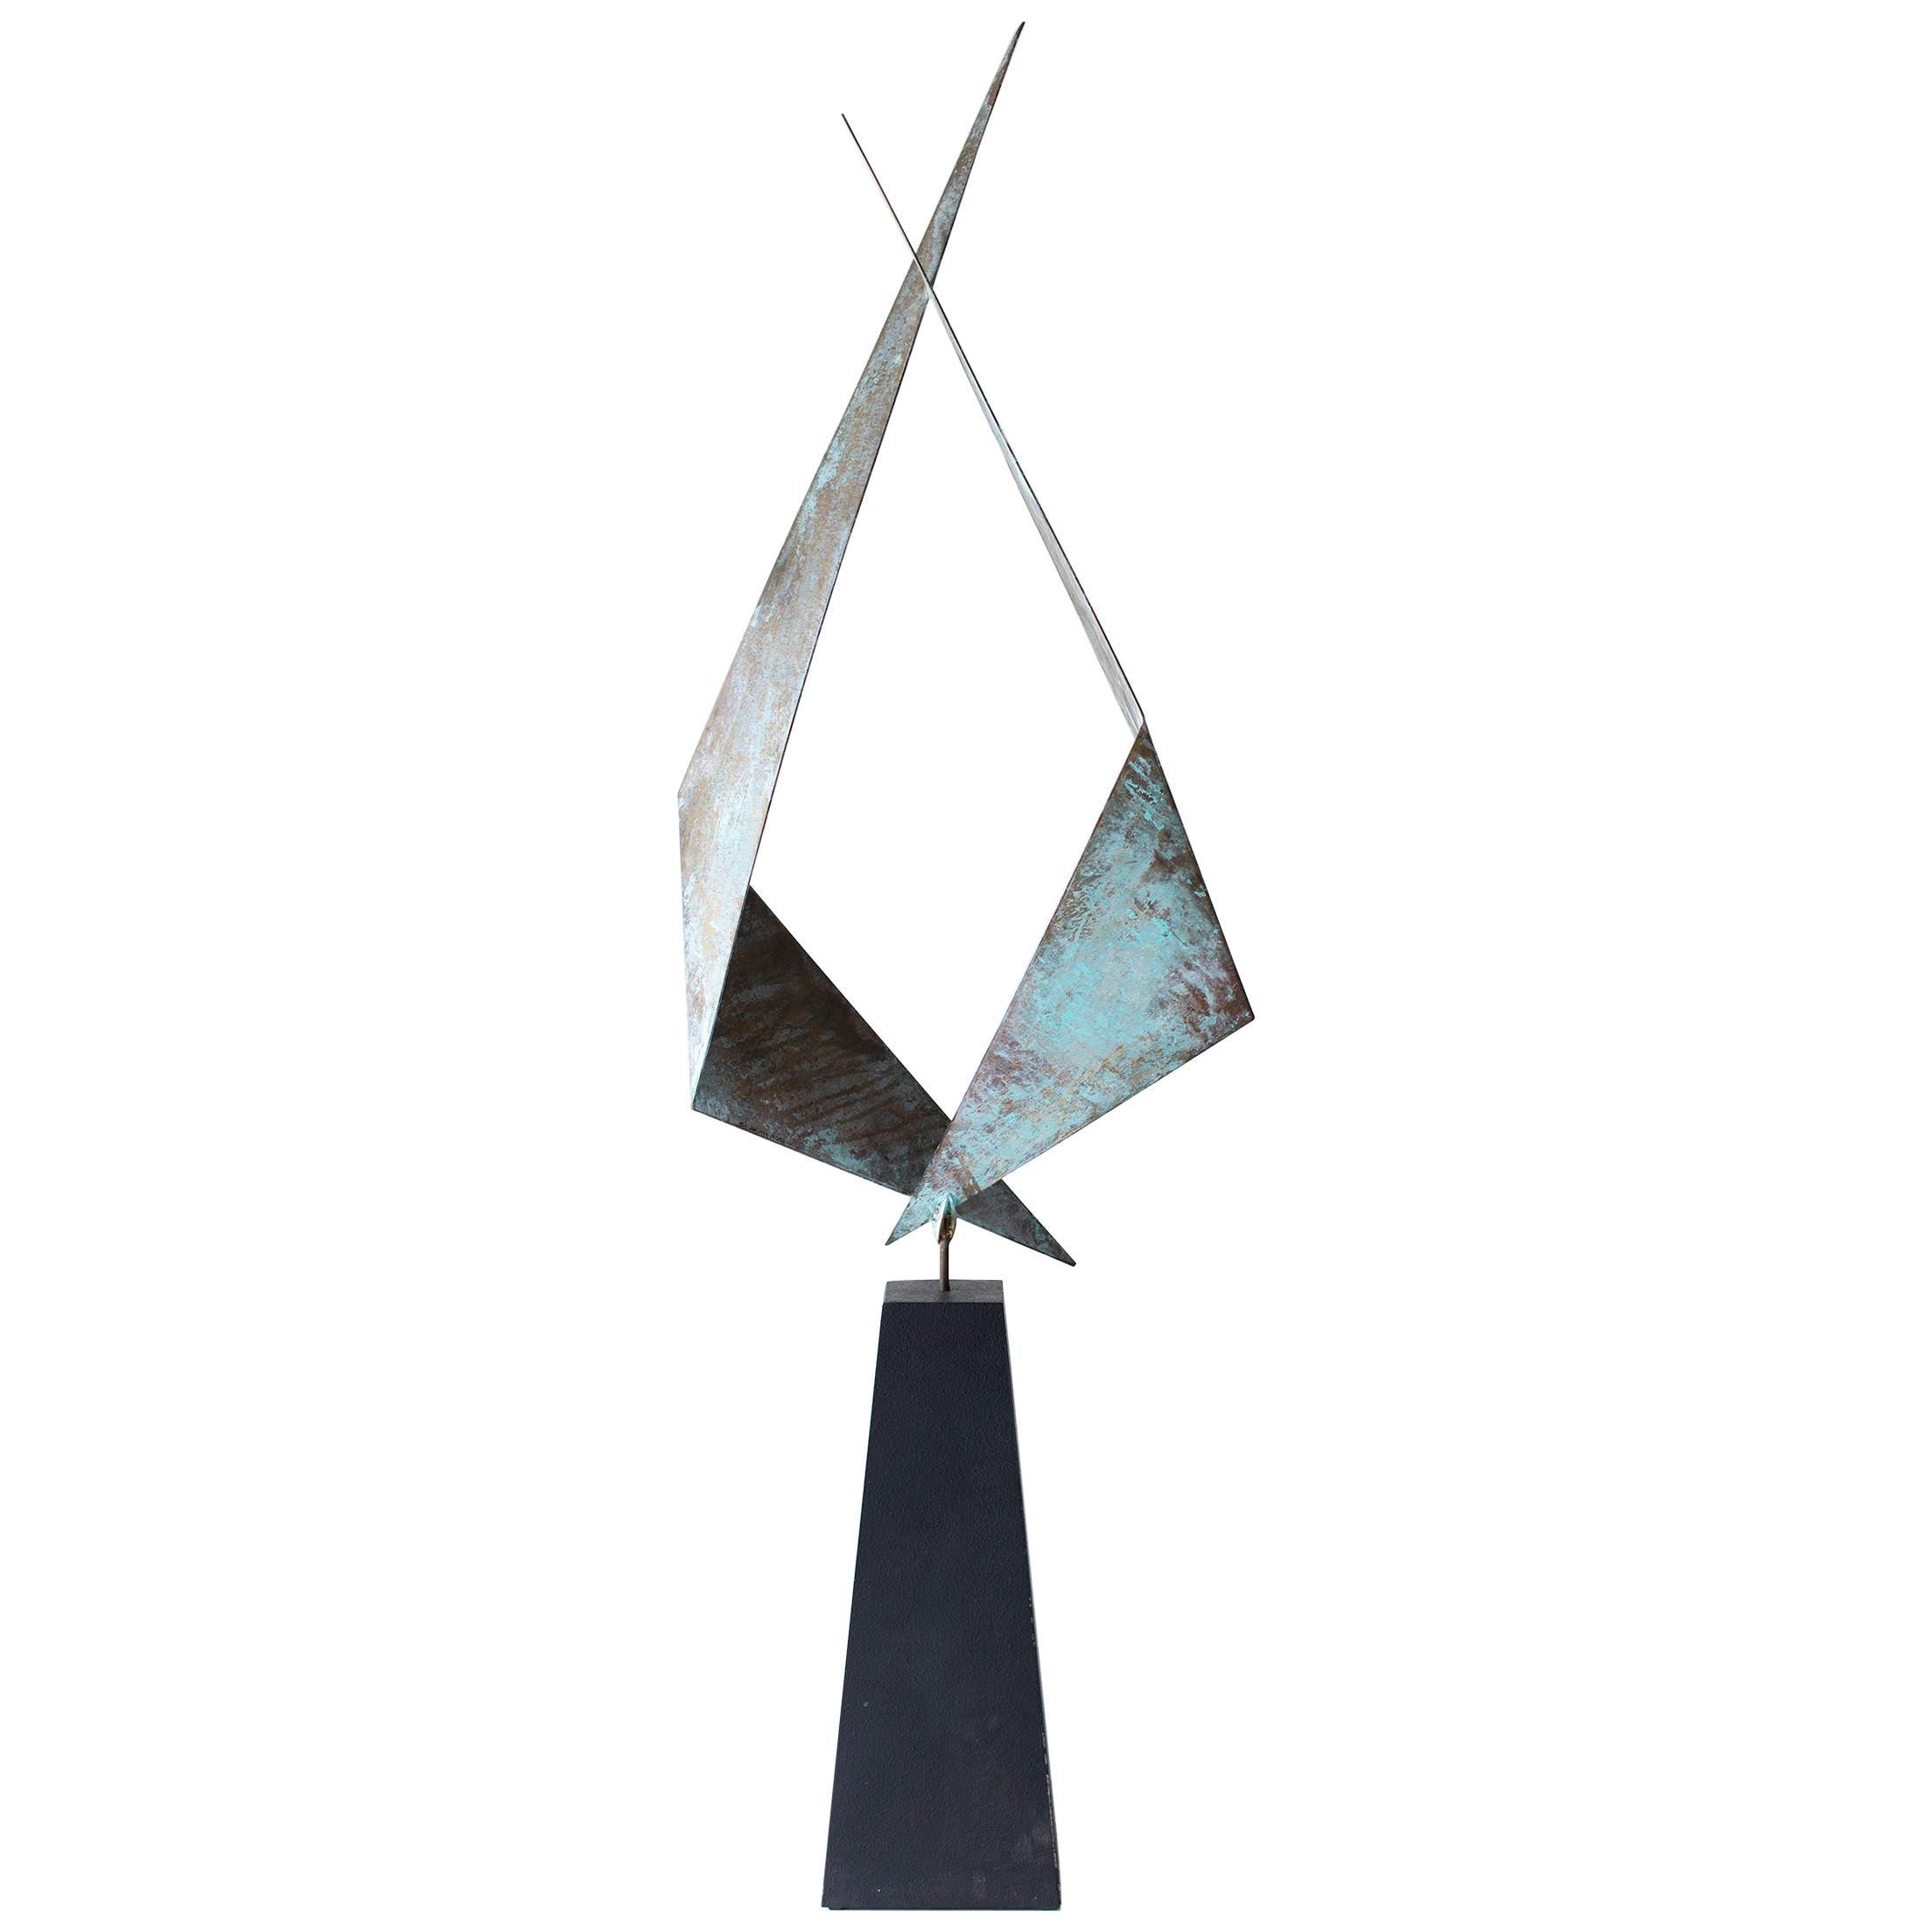 BJ Keith Transcendent Brass Sculpture for C Jere Artisan House